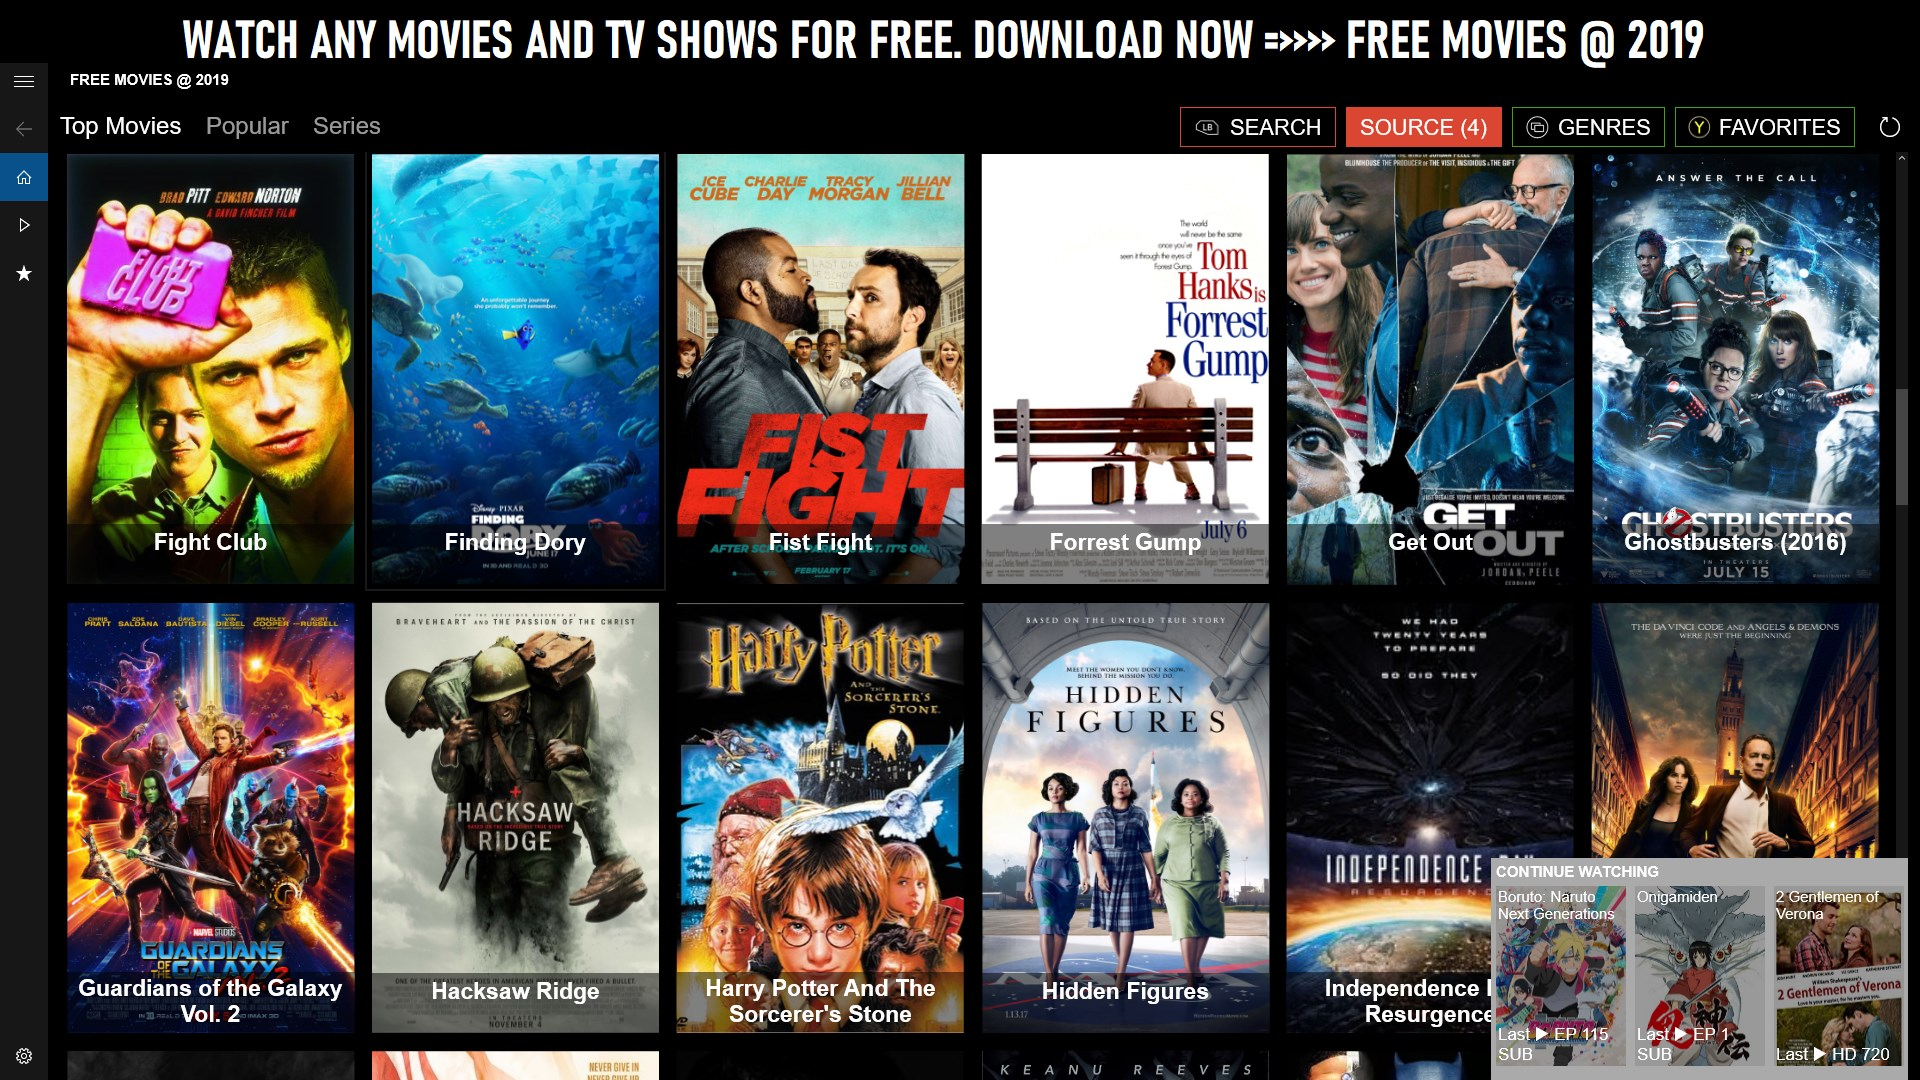 Get Free Movies @ 2019 - Microsoft Store